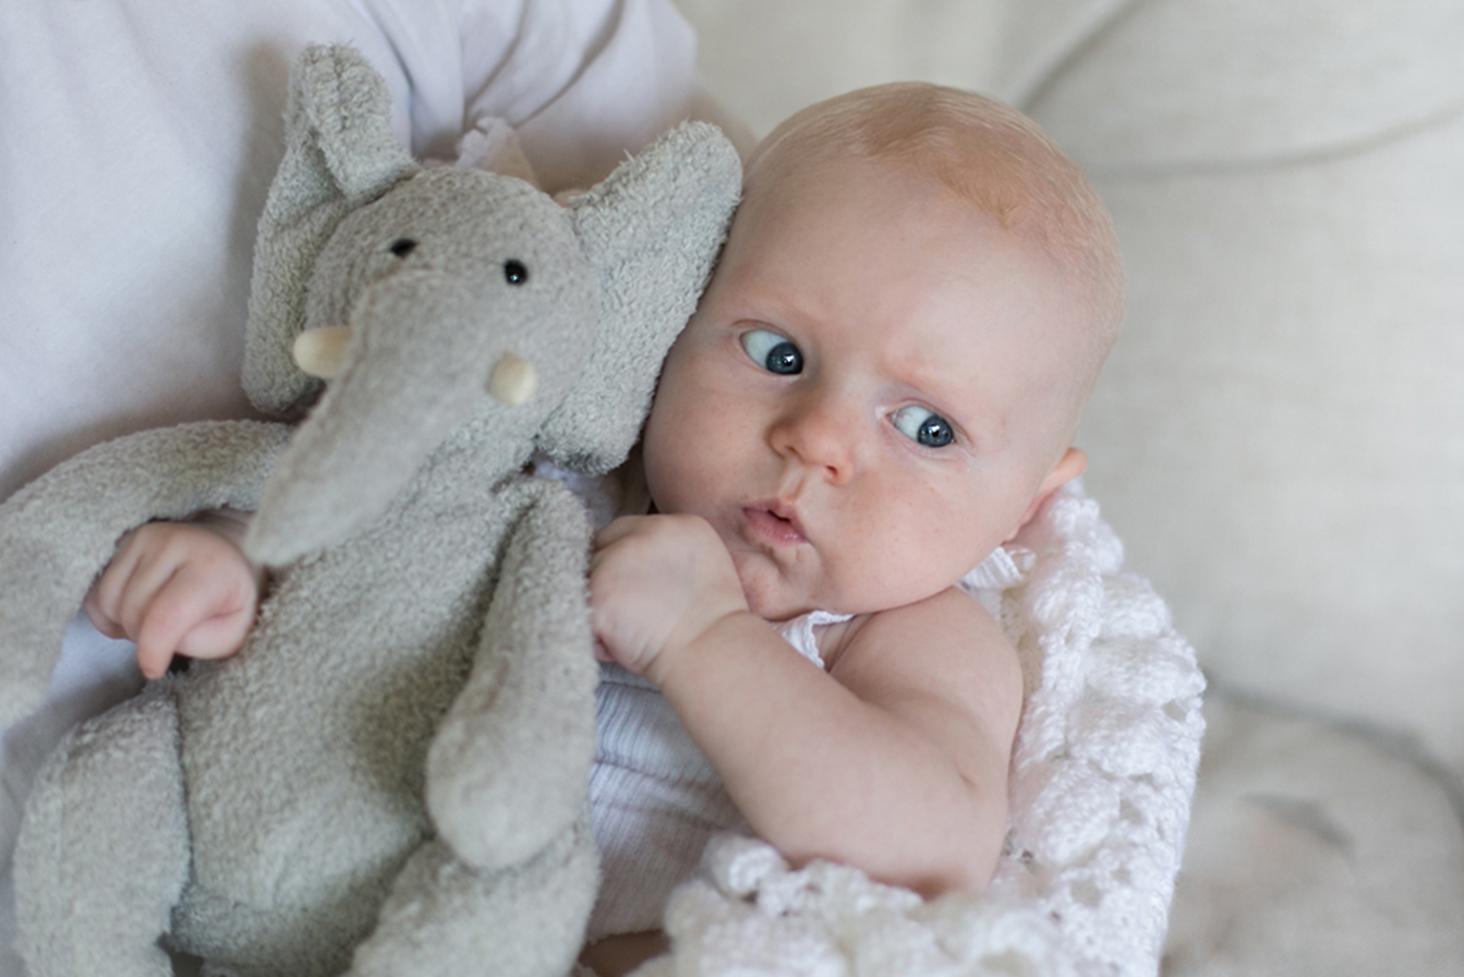 Baby and elephant.jpg